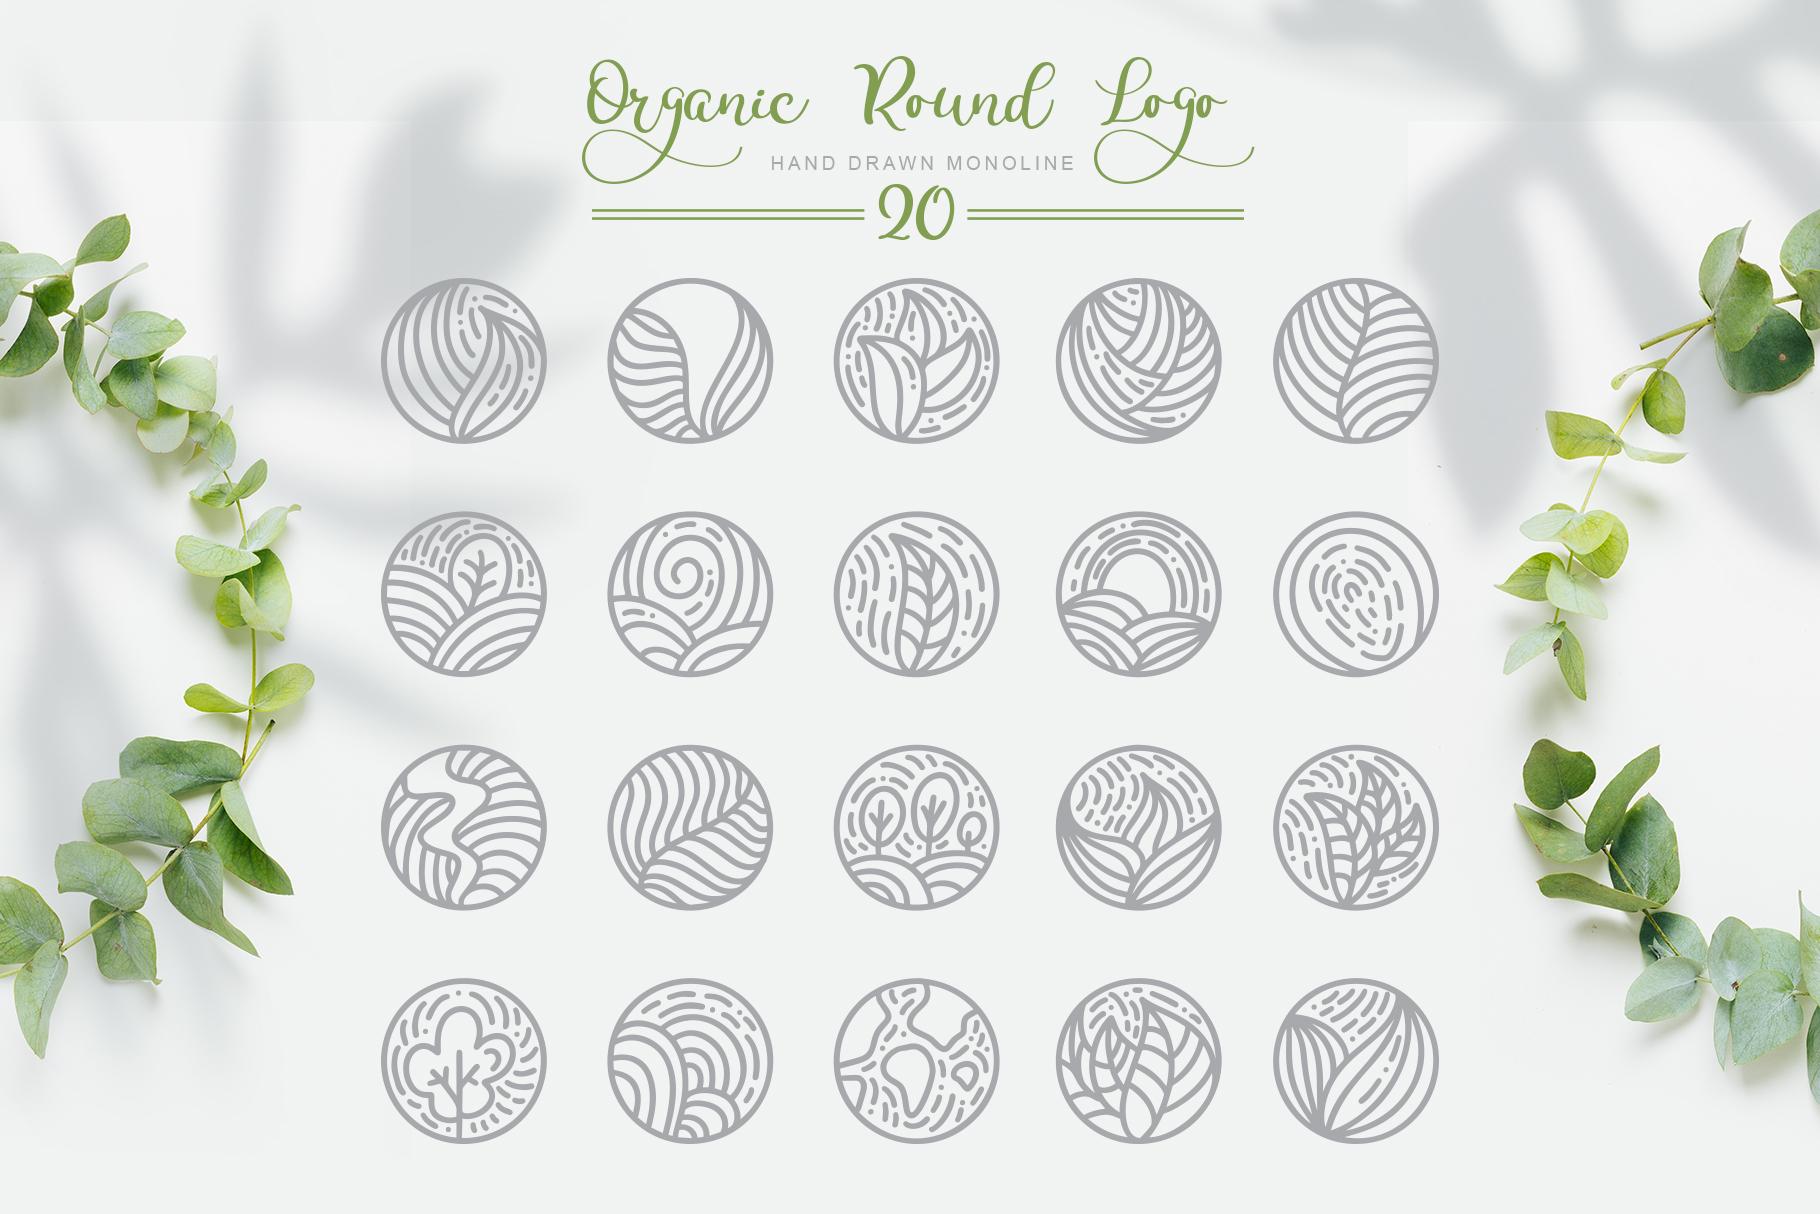 Organic Logo: Organic Round Logo Emblem - title05